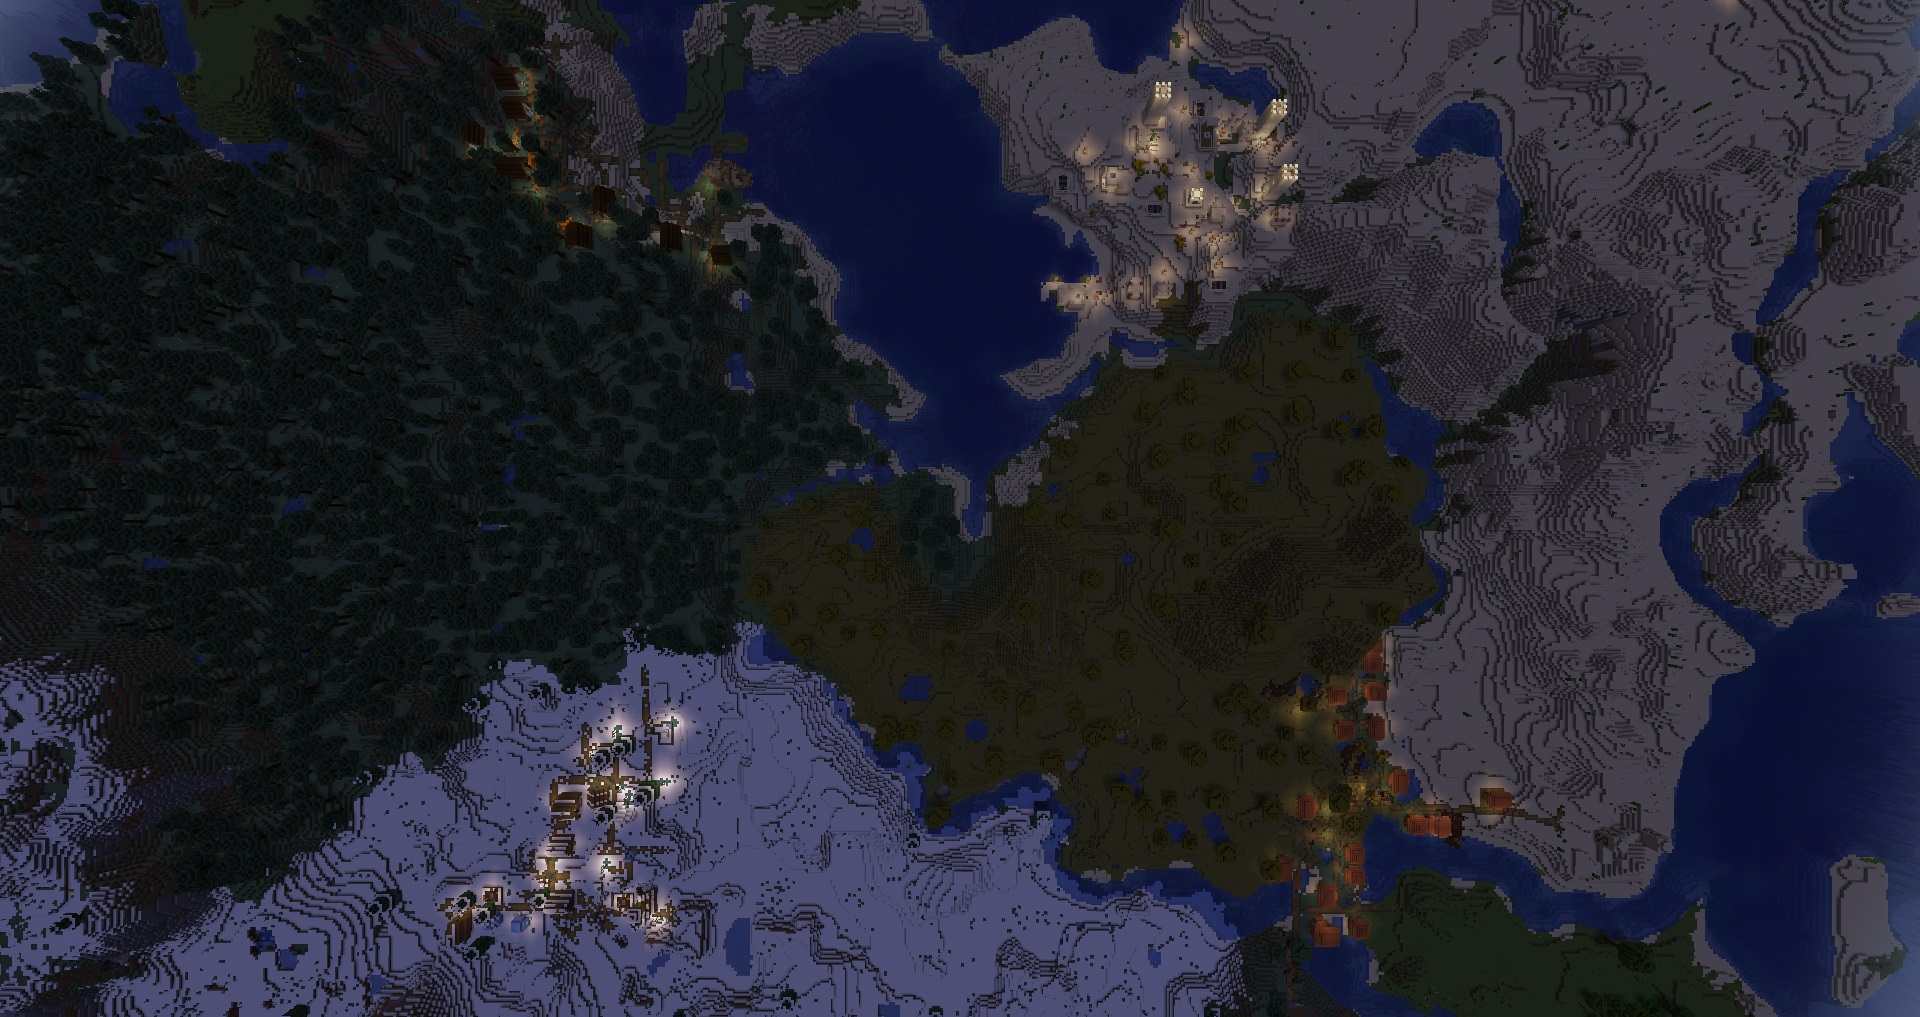 Minecraft seeds - four villages at spawn - A bird's eye view of four minecraft villages at sunest: a desert, jungle, snow, and taige village